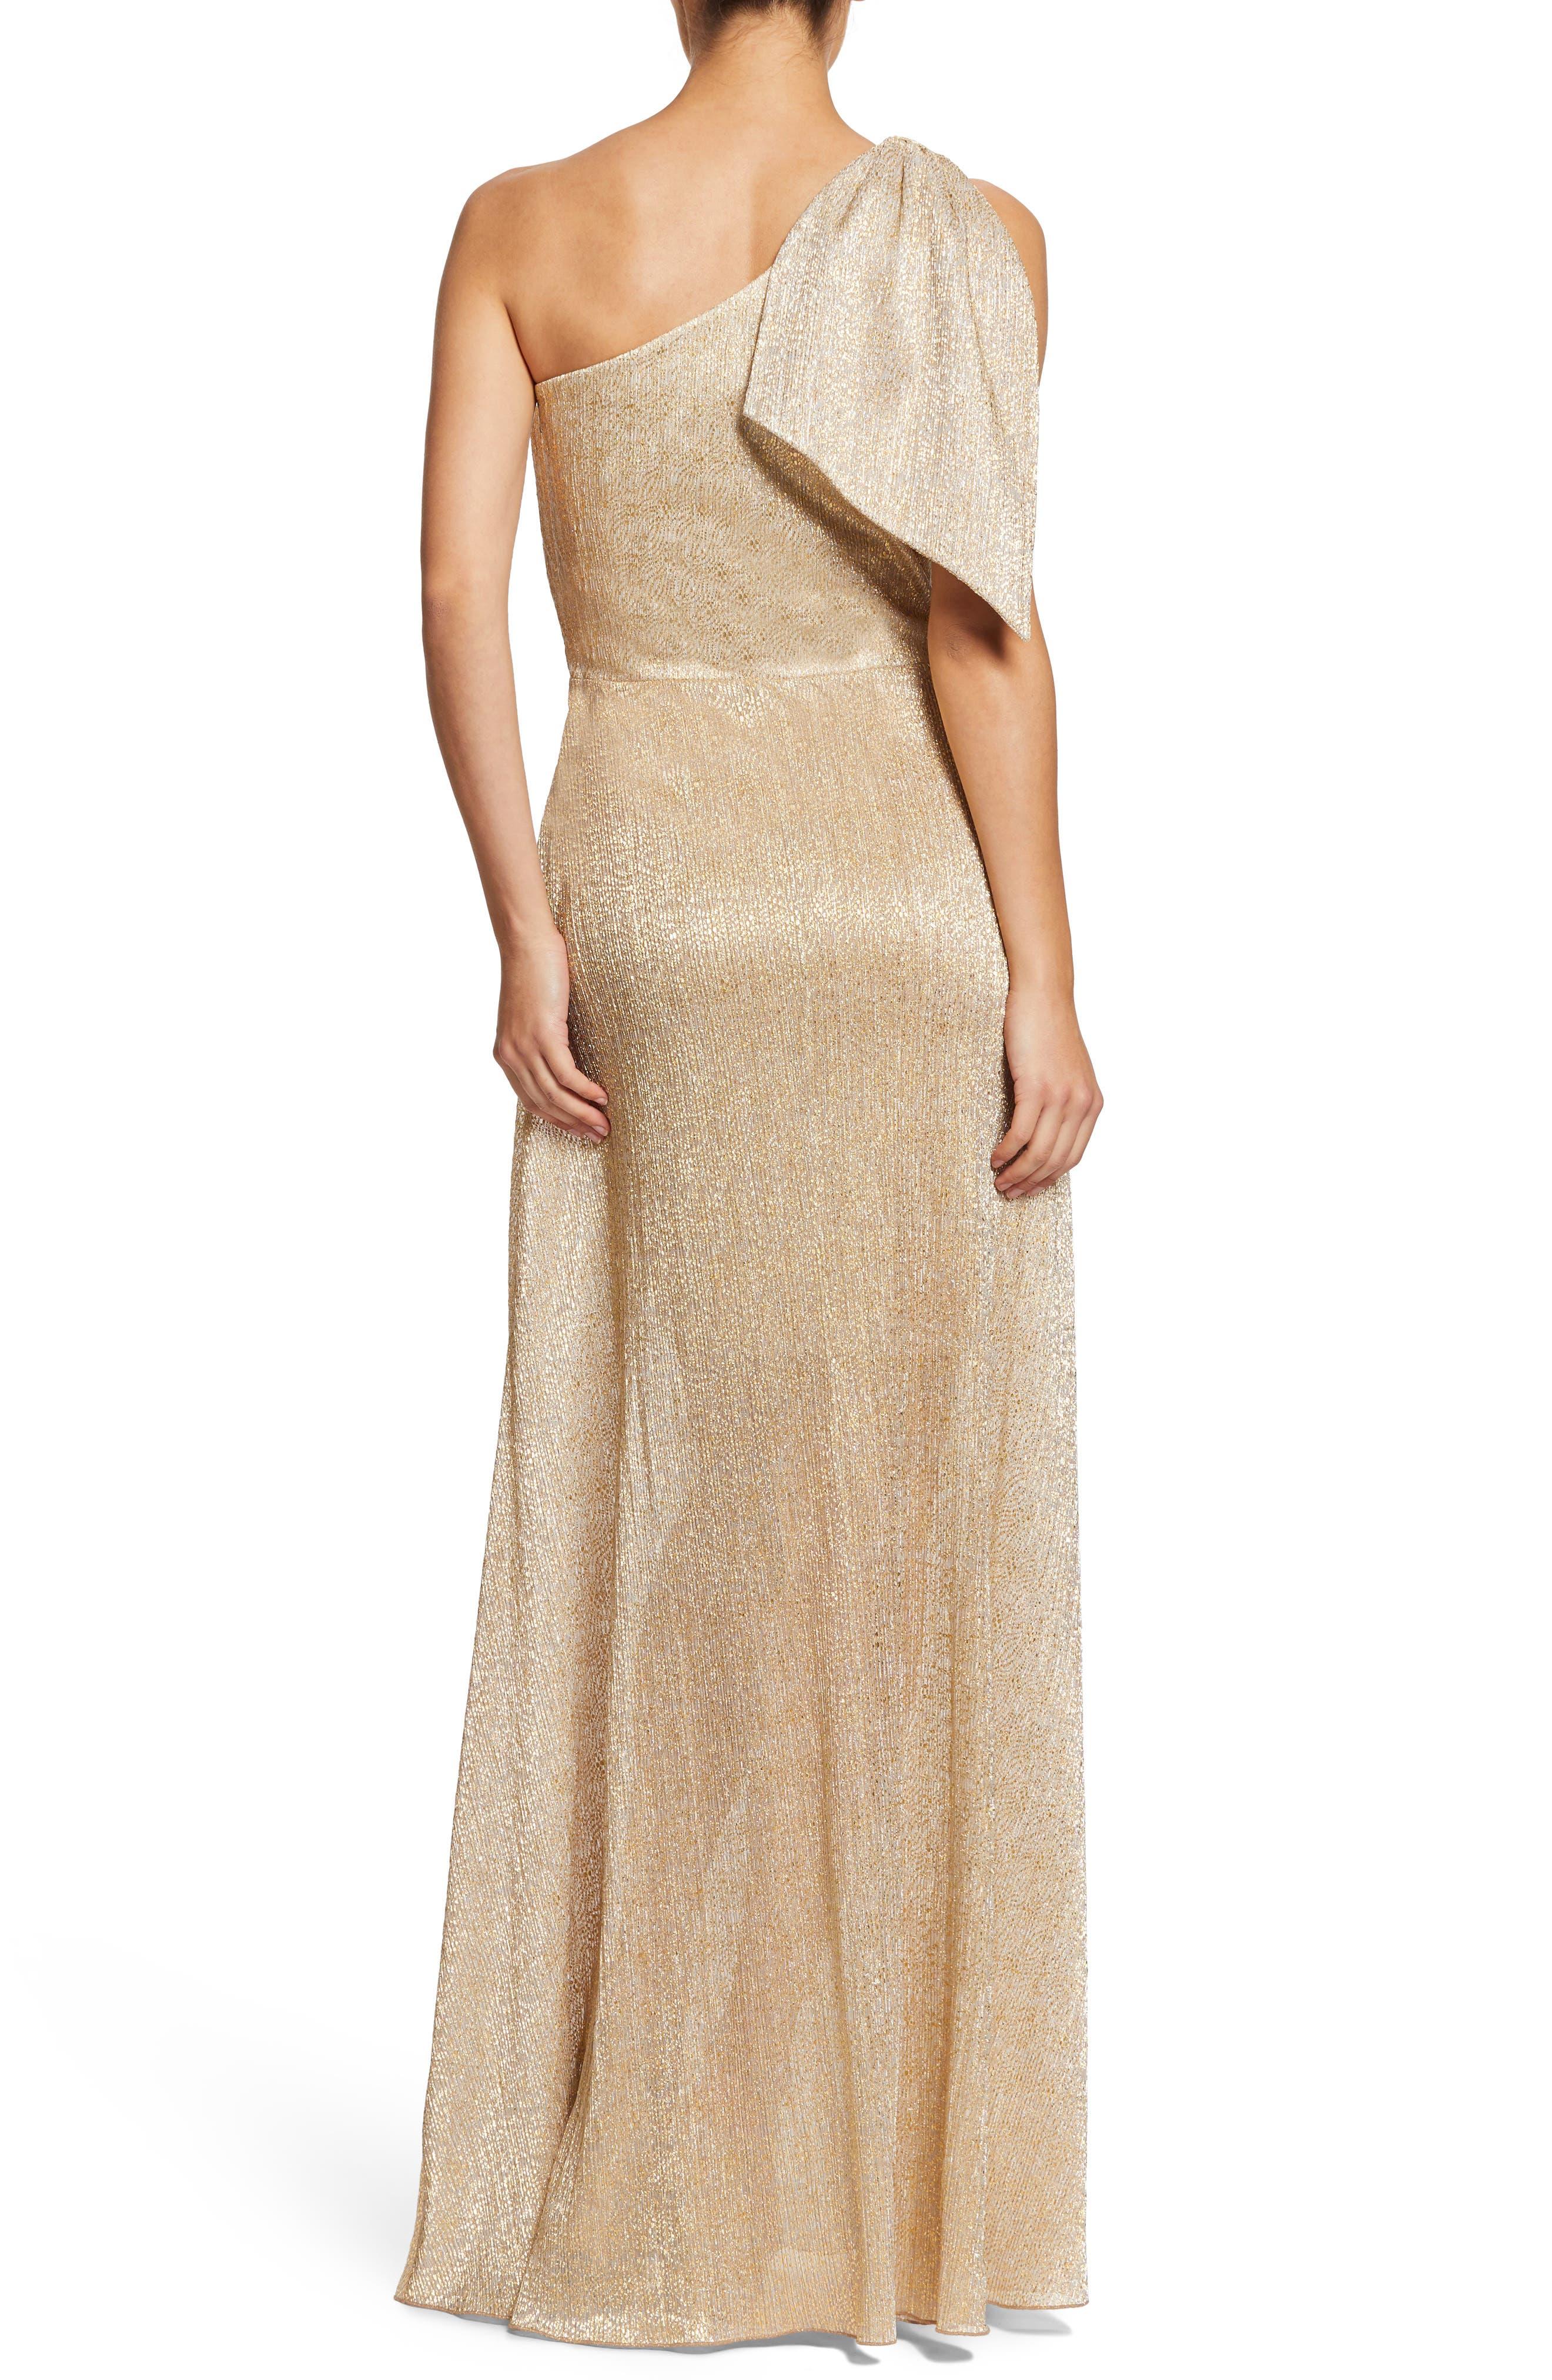 Savannah One-Shoulder Gown,                             Alternate thumbnail 2, color,                             GOLD